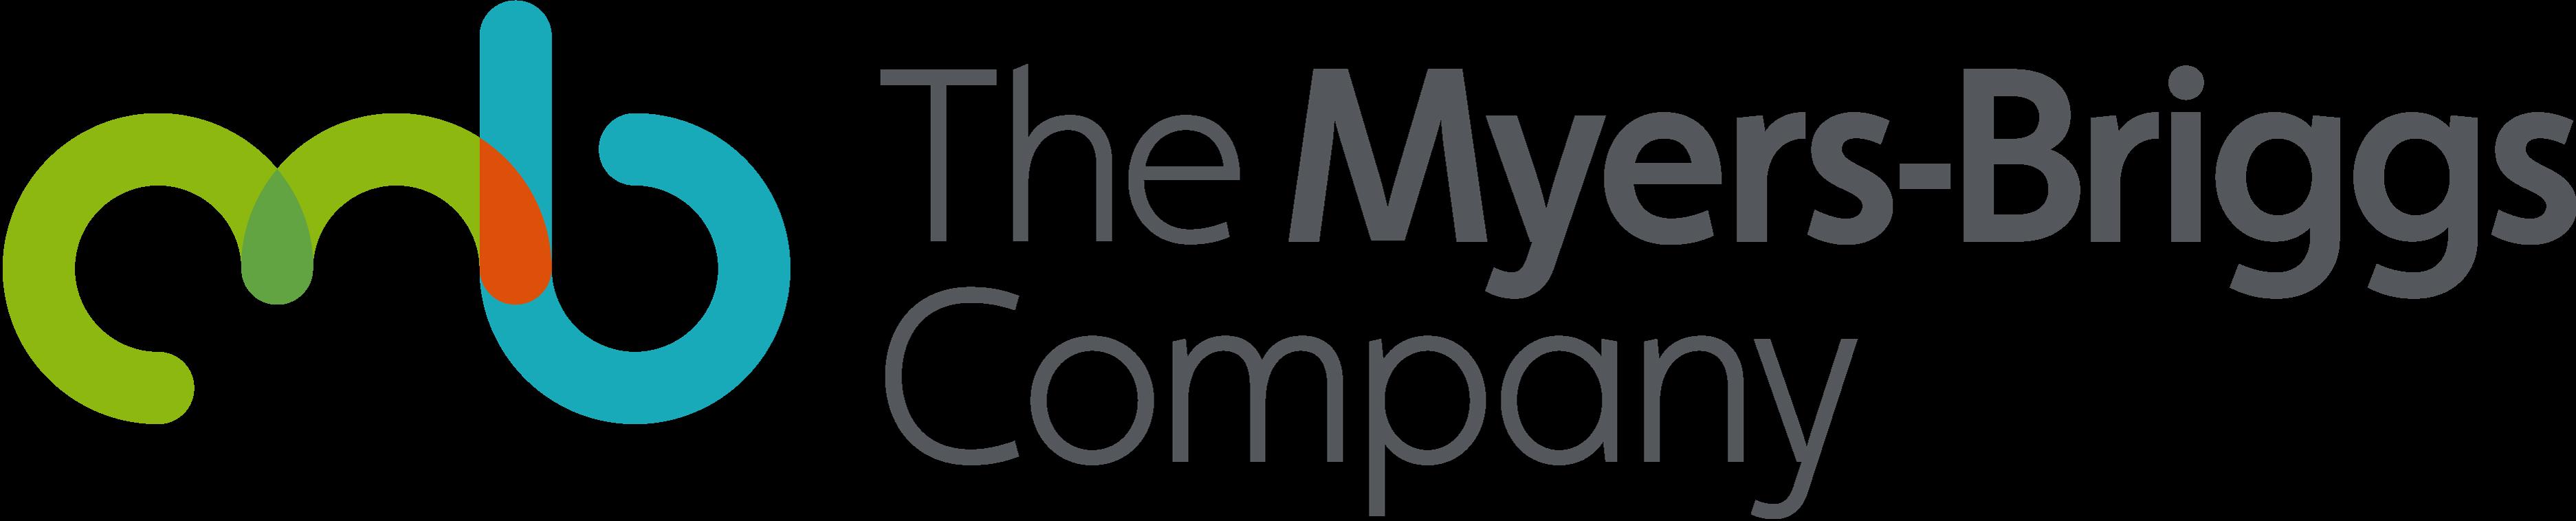 The Myers-Briggs Company Pty Ltd